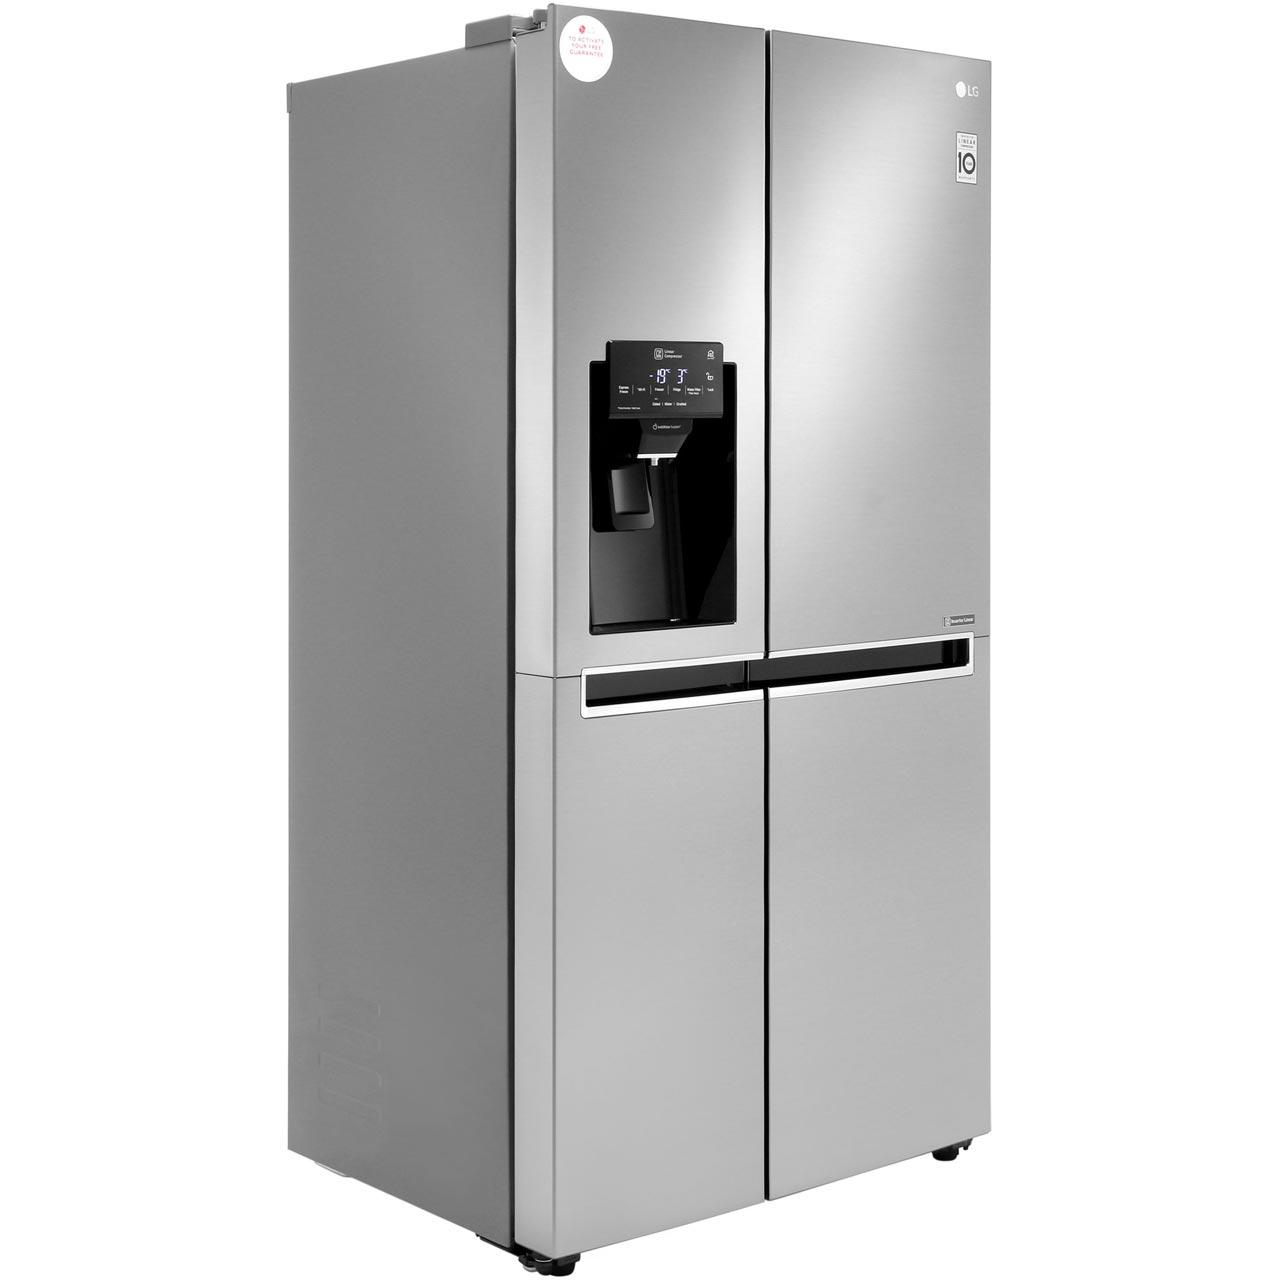 Boots kitchen appliances washing machines fridges more - Nevera americana medidas ...